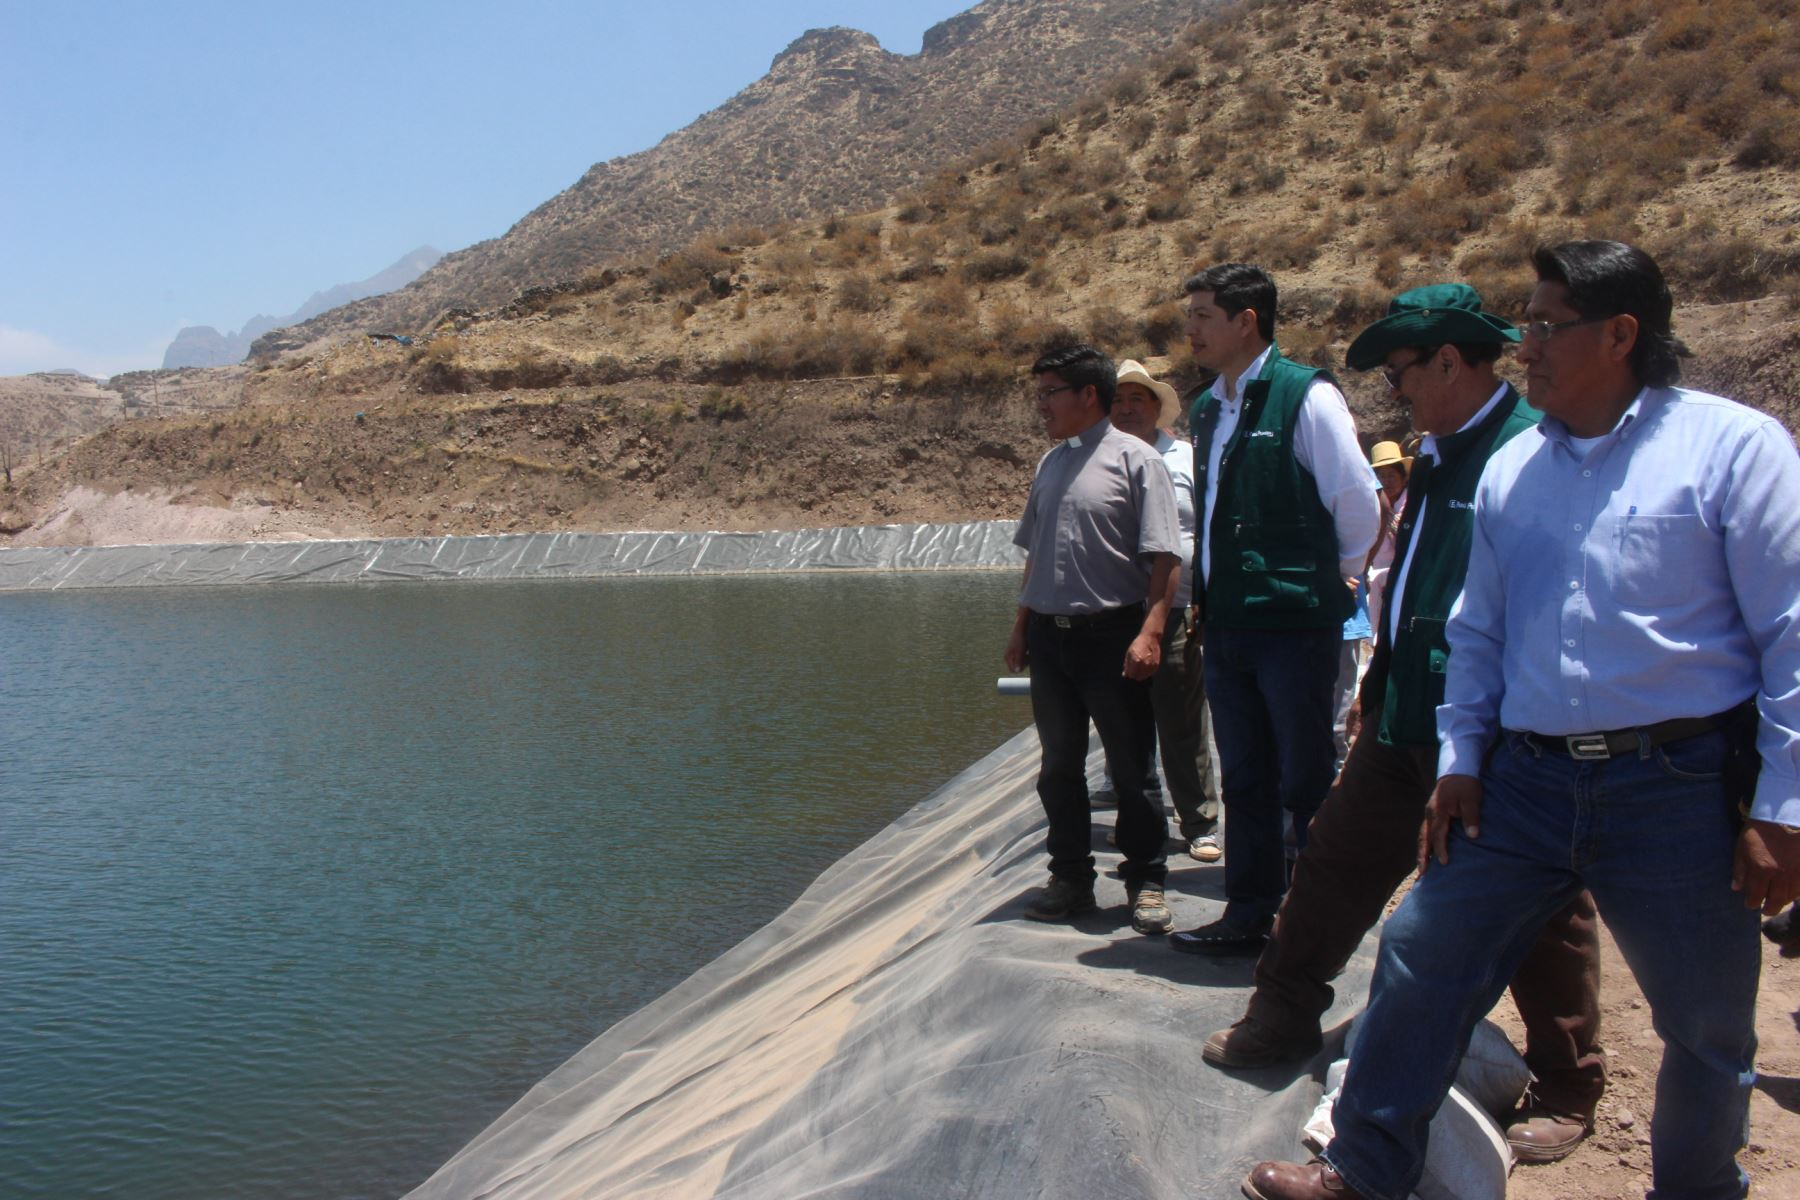 Minagri invierte S/ 1.86 millones para mejorar sistema de riego en Huarochirí. ANDINA/Difusión